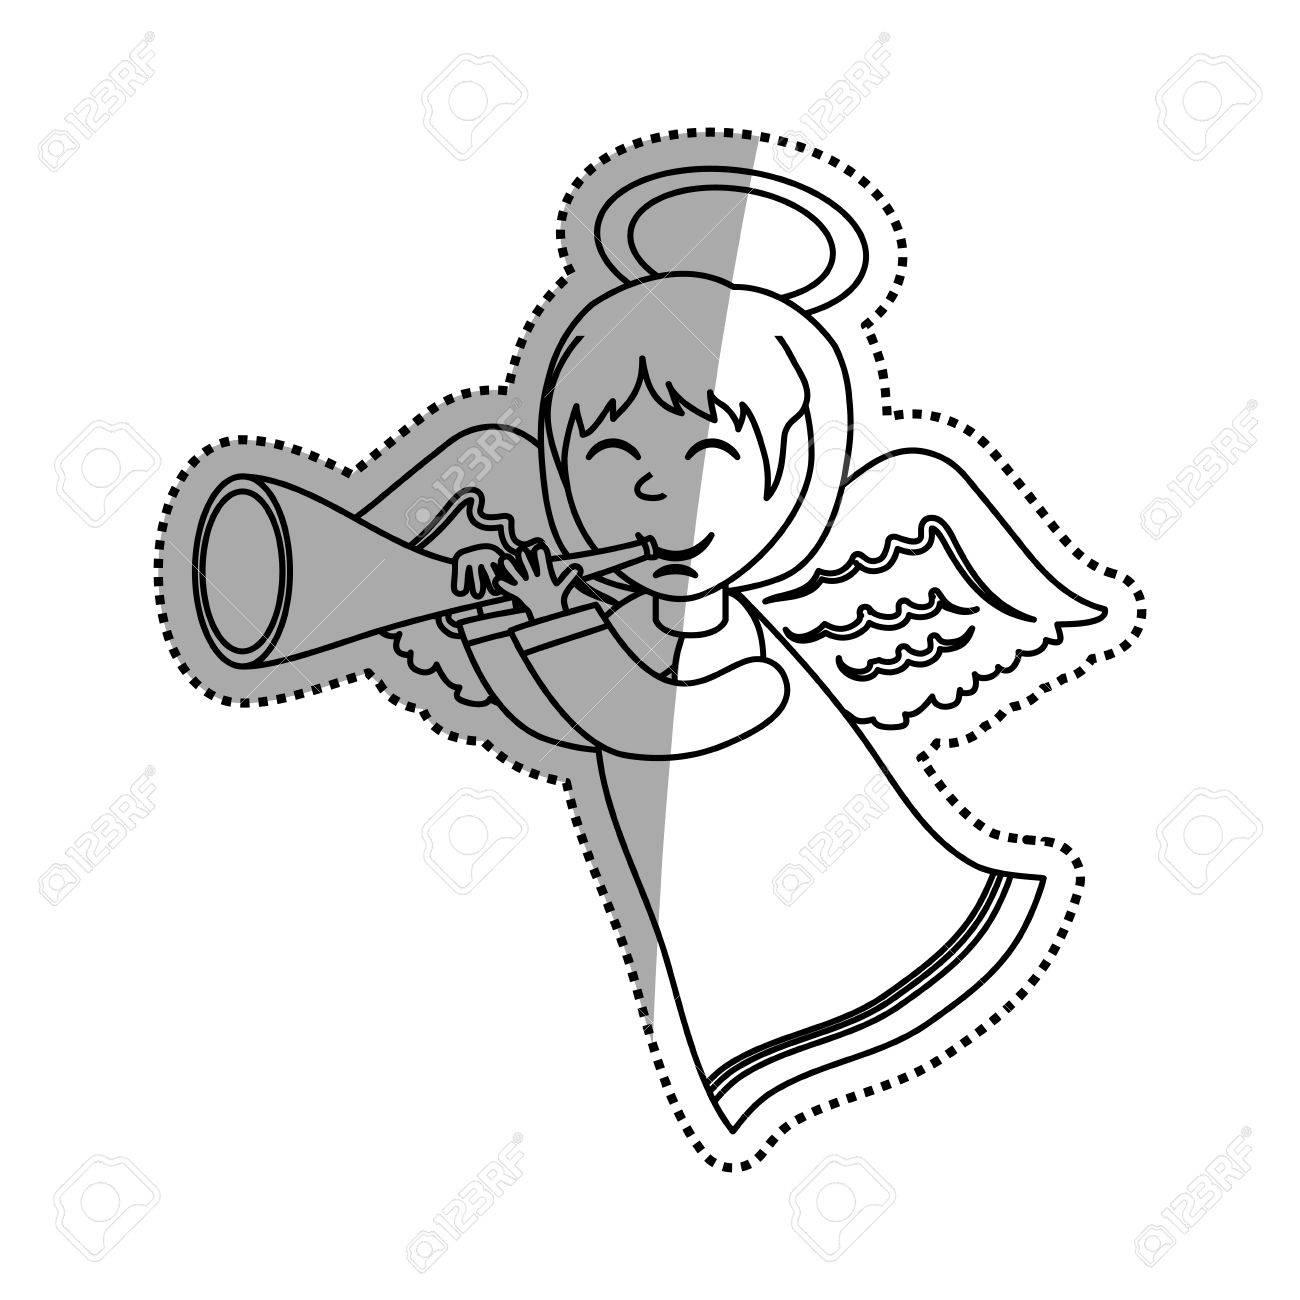 1300x1300 Cute Angel Cartoon Icon Vector Illustration Graphic Design Royalty